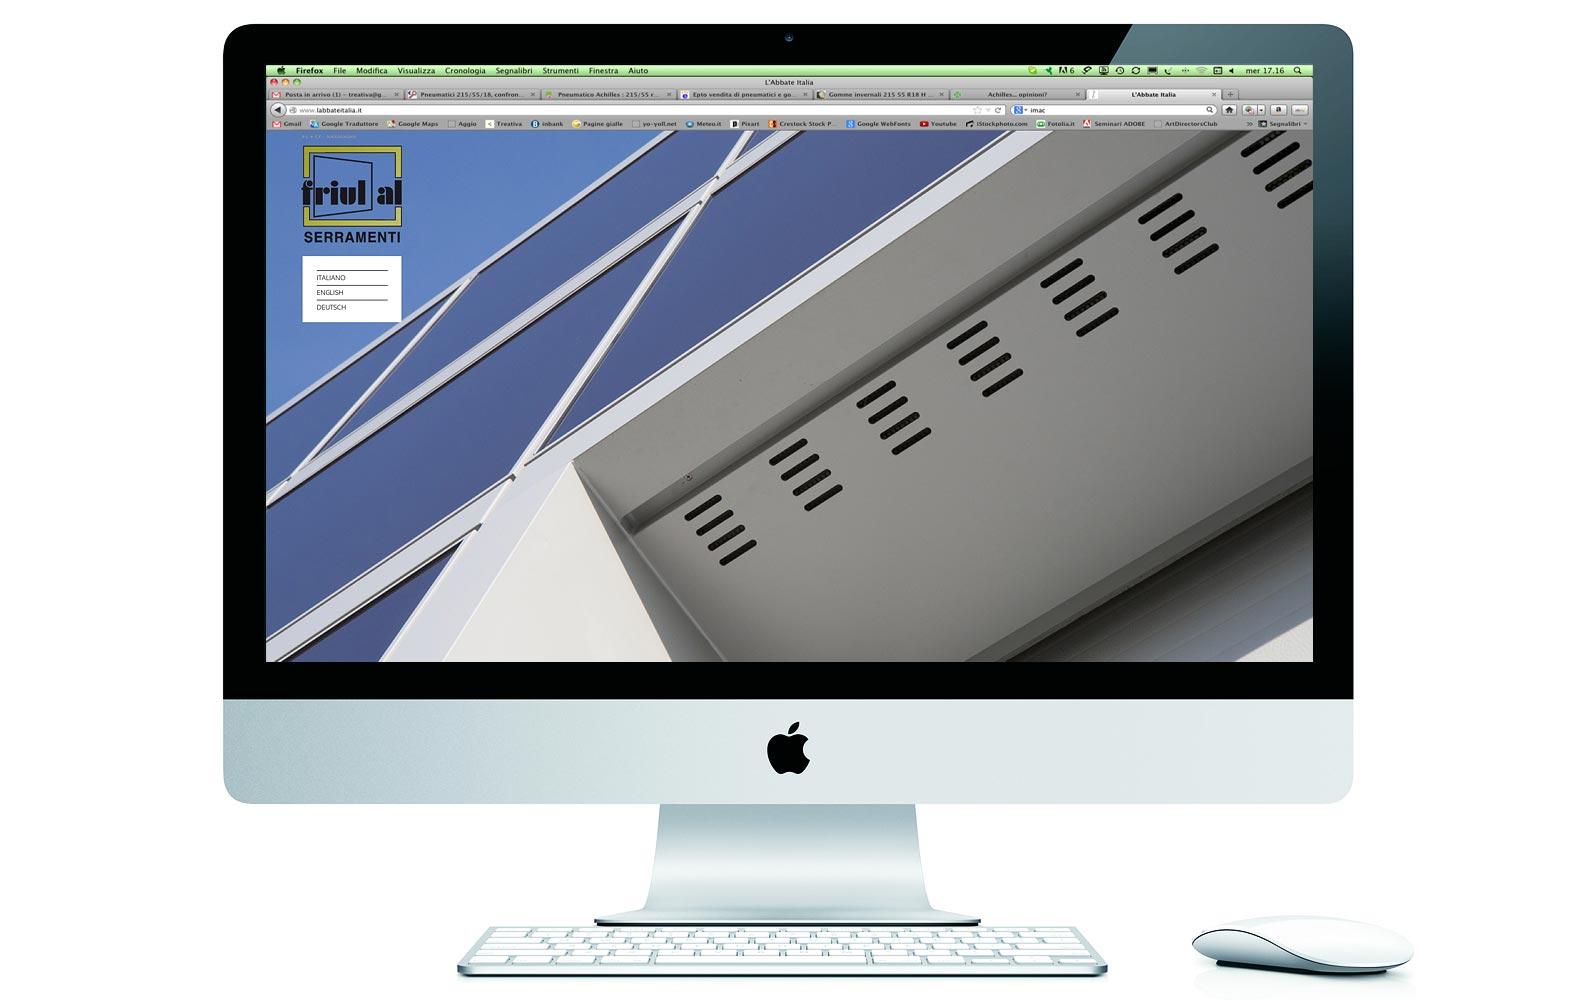 Friul Al iMac_immagine_2000x1260